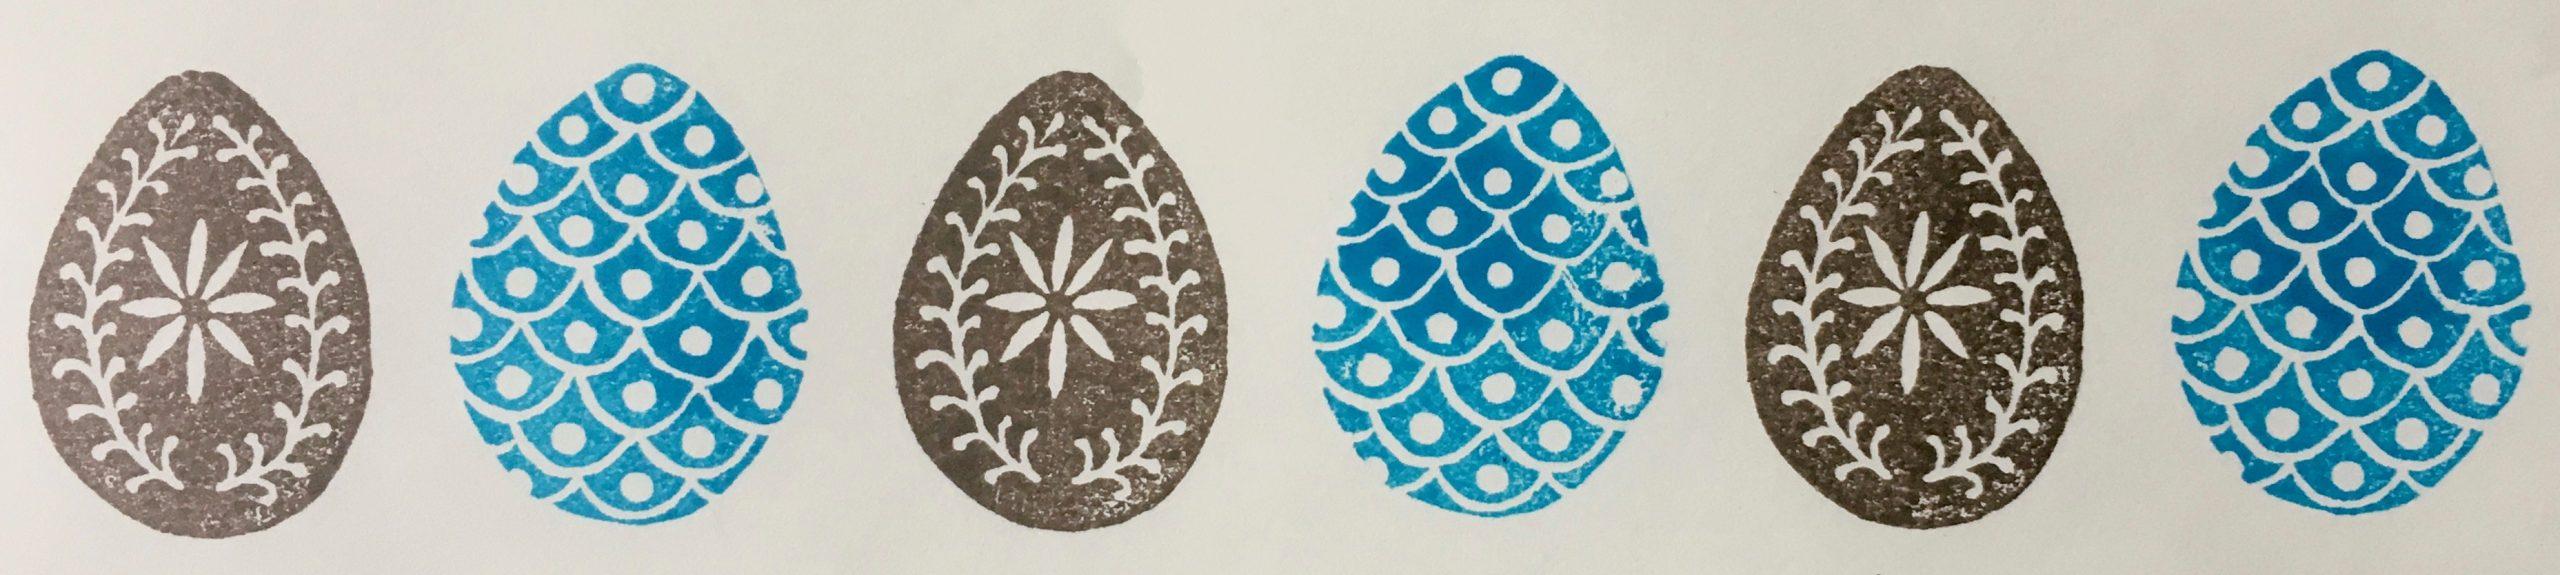 Cambridge Imprint Easter Egg Border